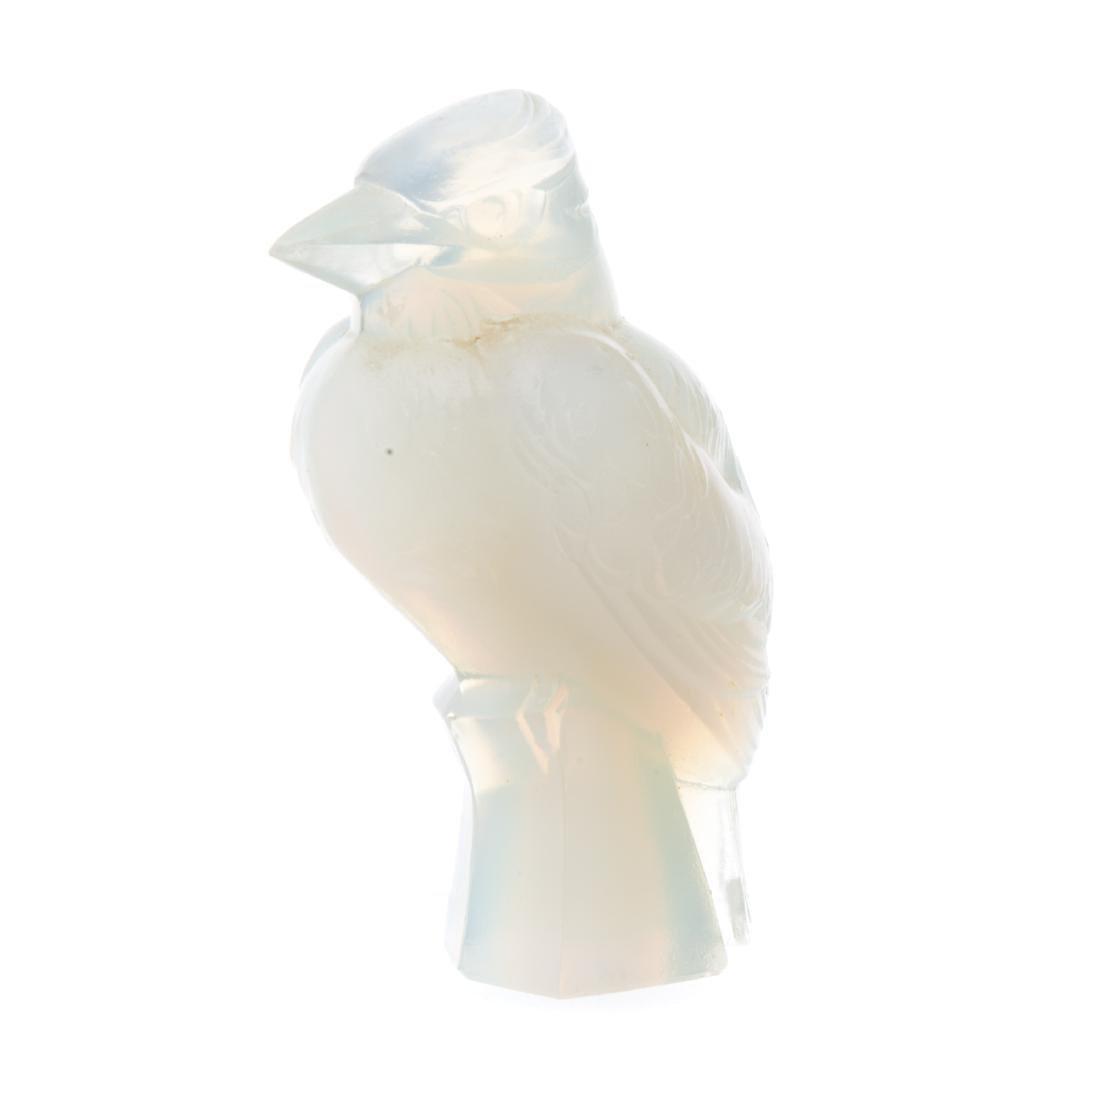 Sabino glass torso, songbird, and Lalique vase - 3